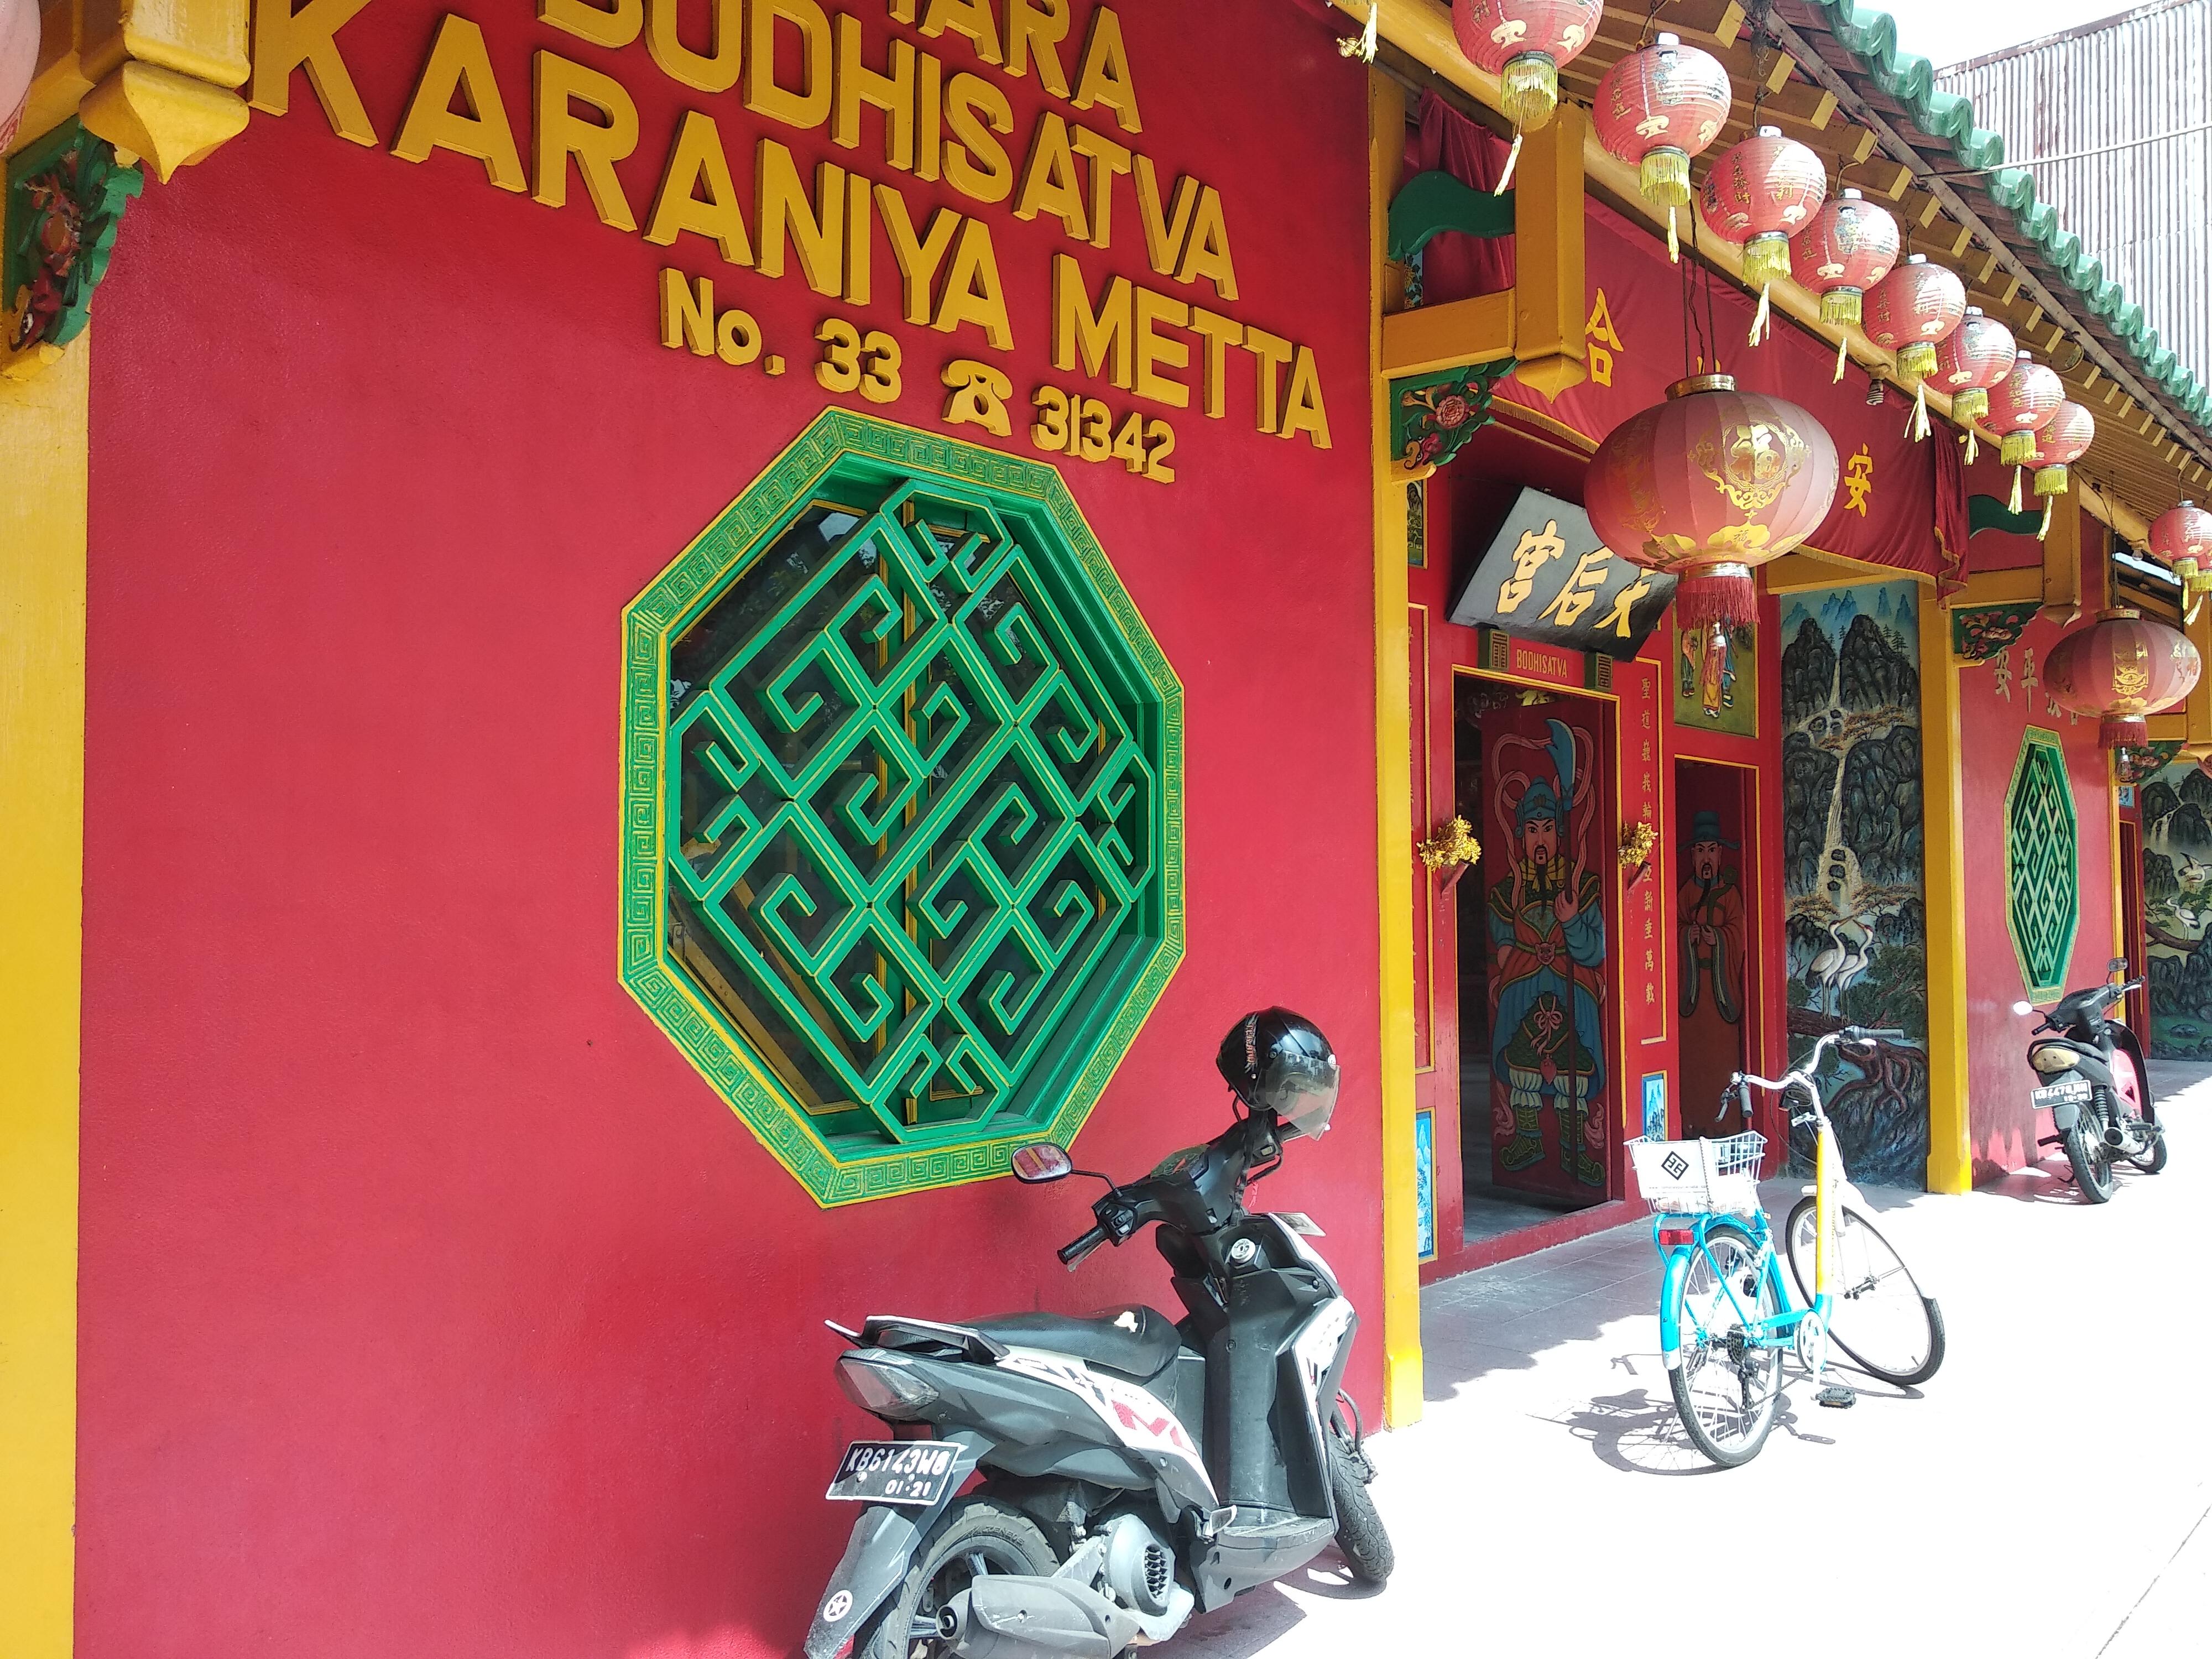 Vihara Bodhisatva Karaniya Metta - Bicycle Tour & Rental Pontianak